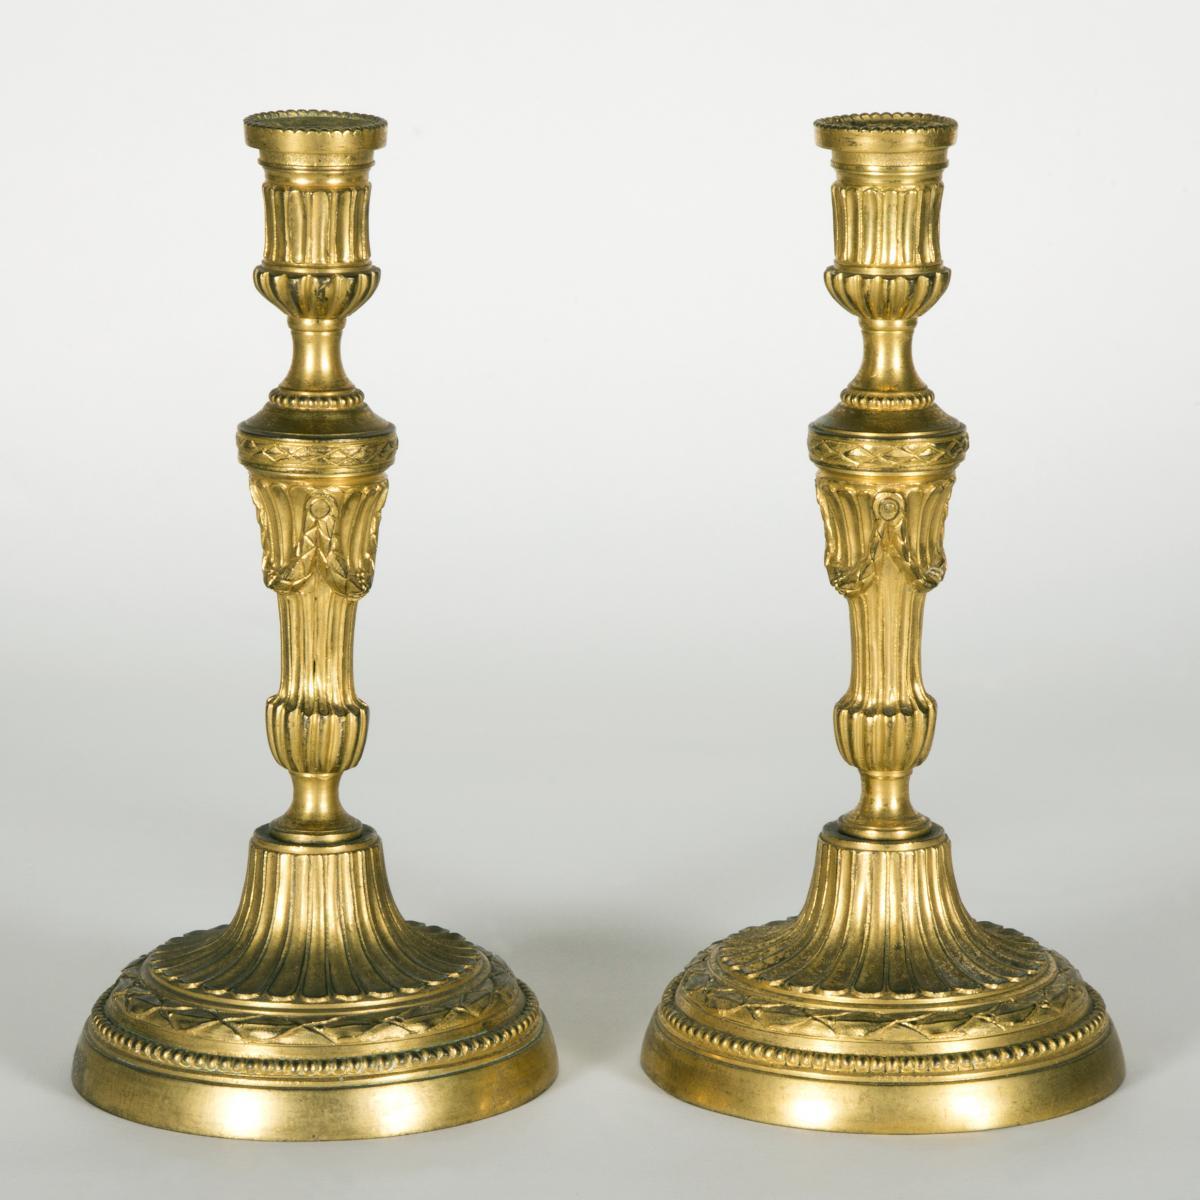 Paire de bougeoirs en bronze doré, XVIIIe